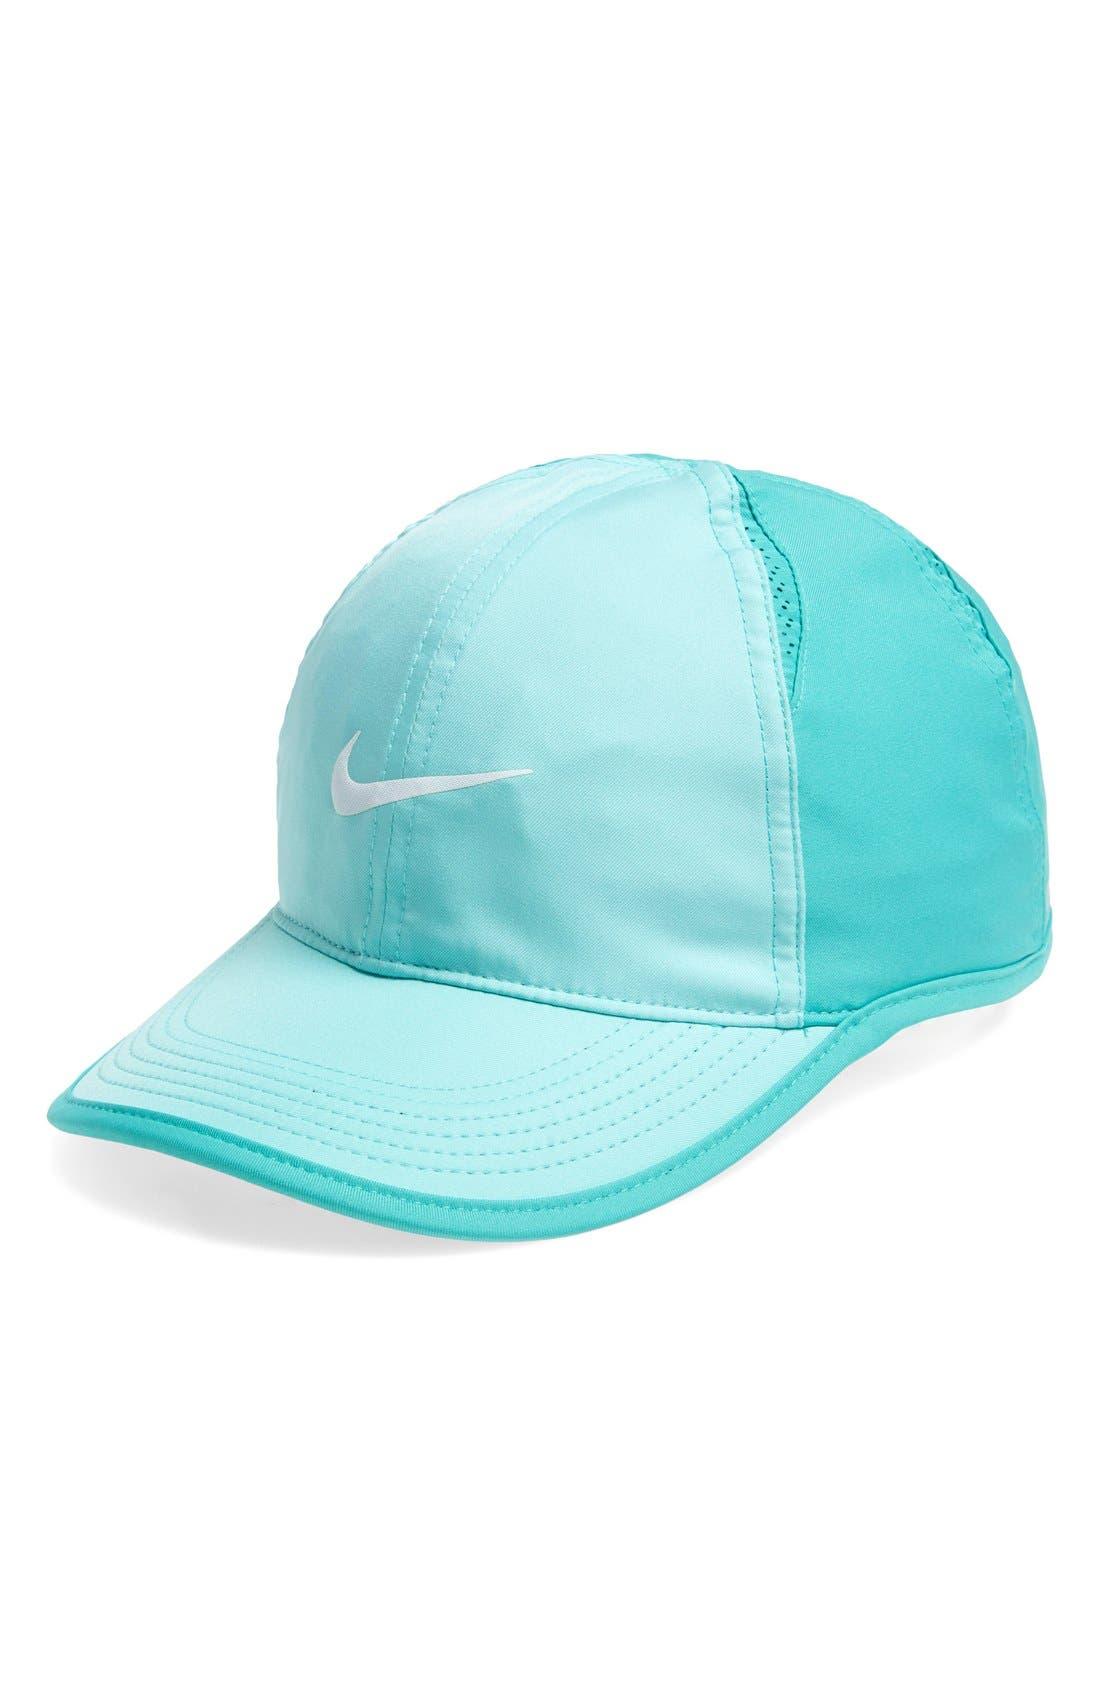 Main Image - Nike 'Feather Light' Dri-FIT Cap